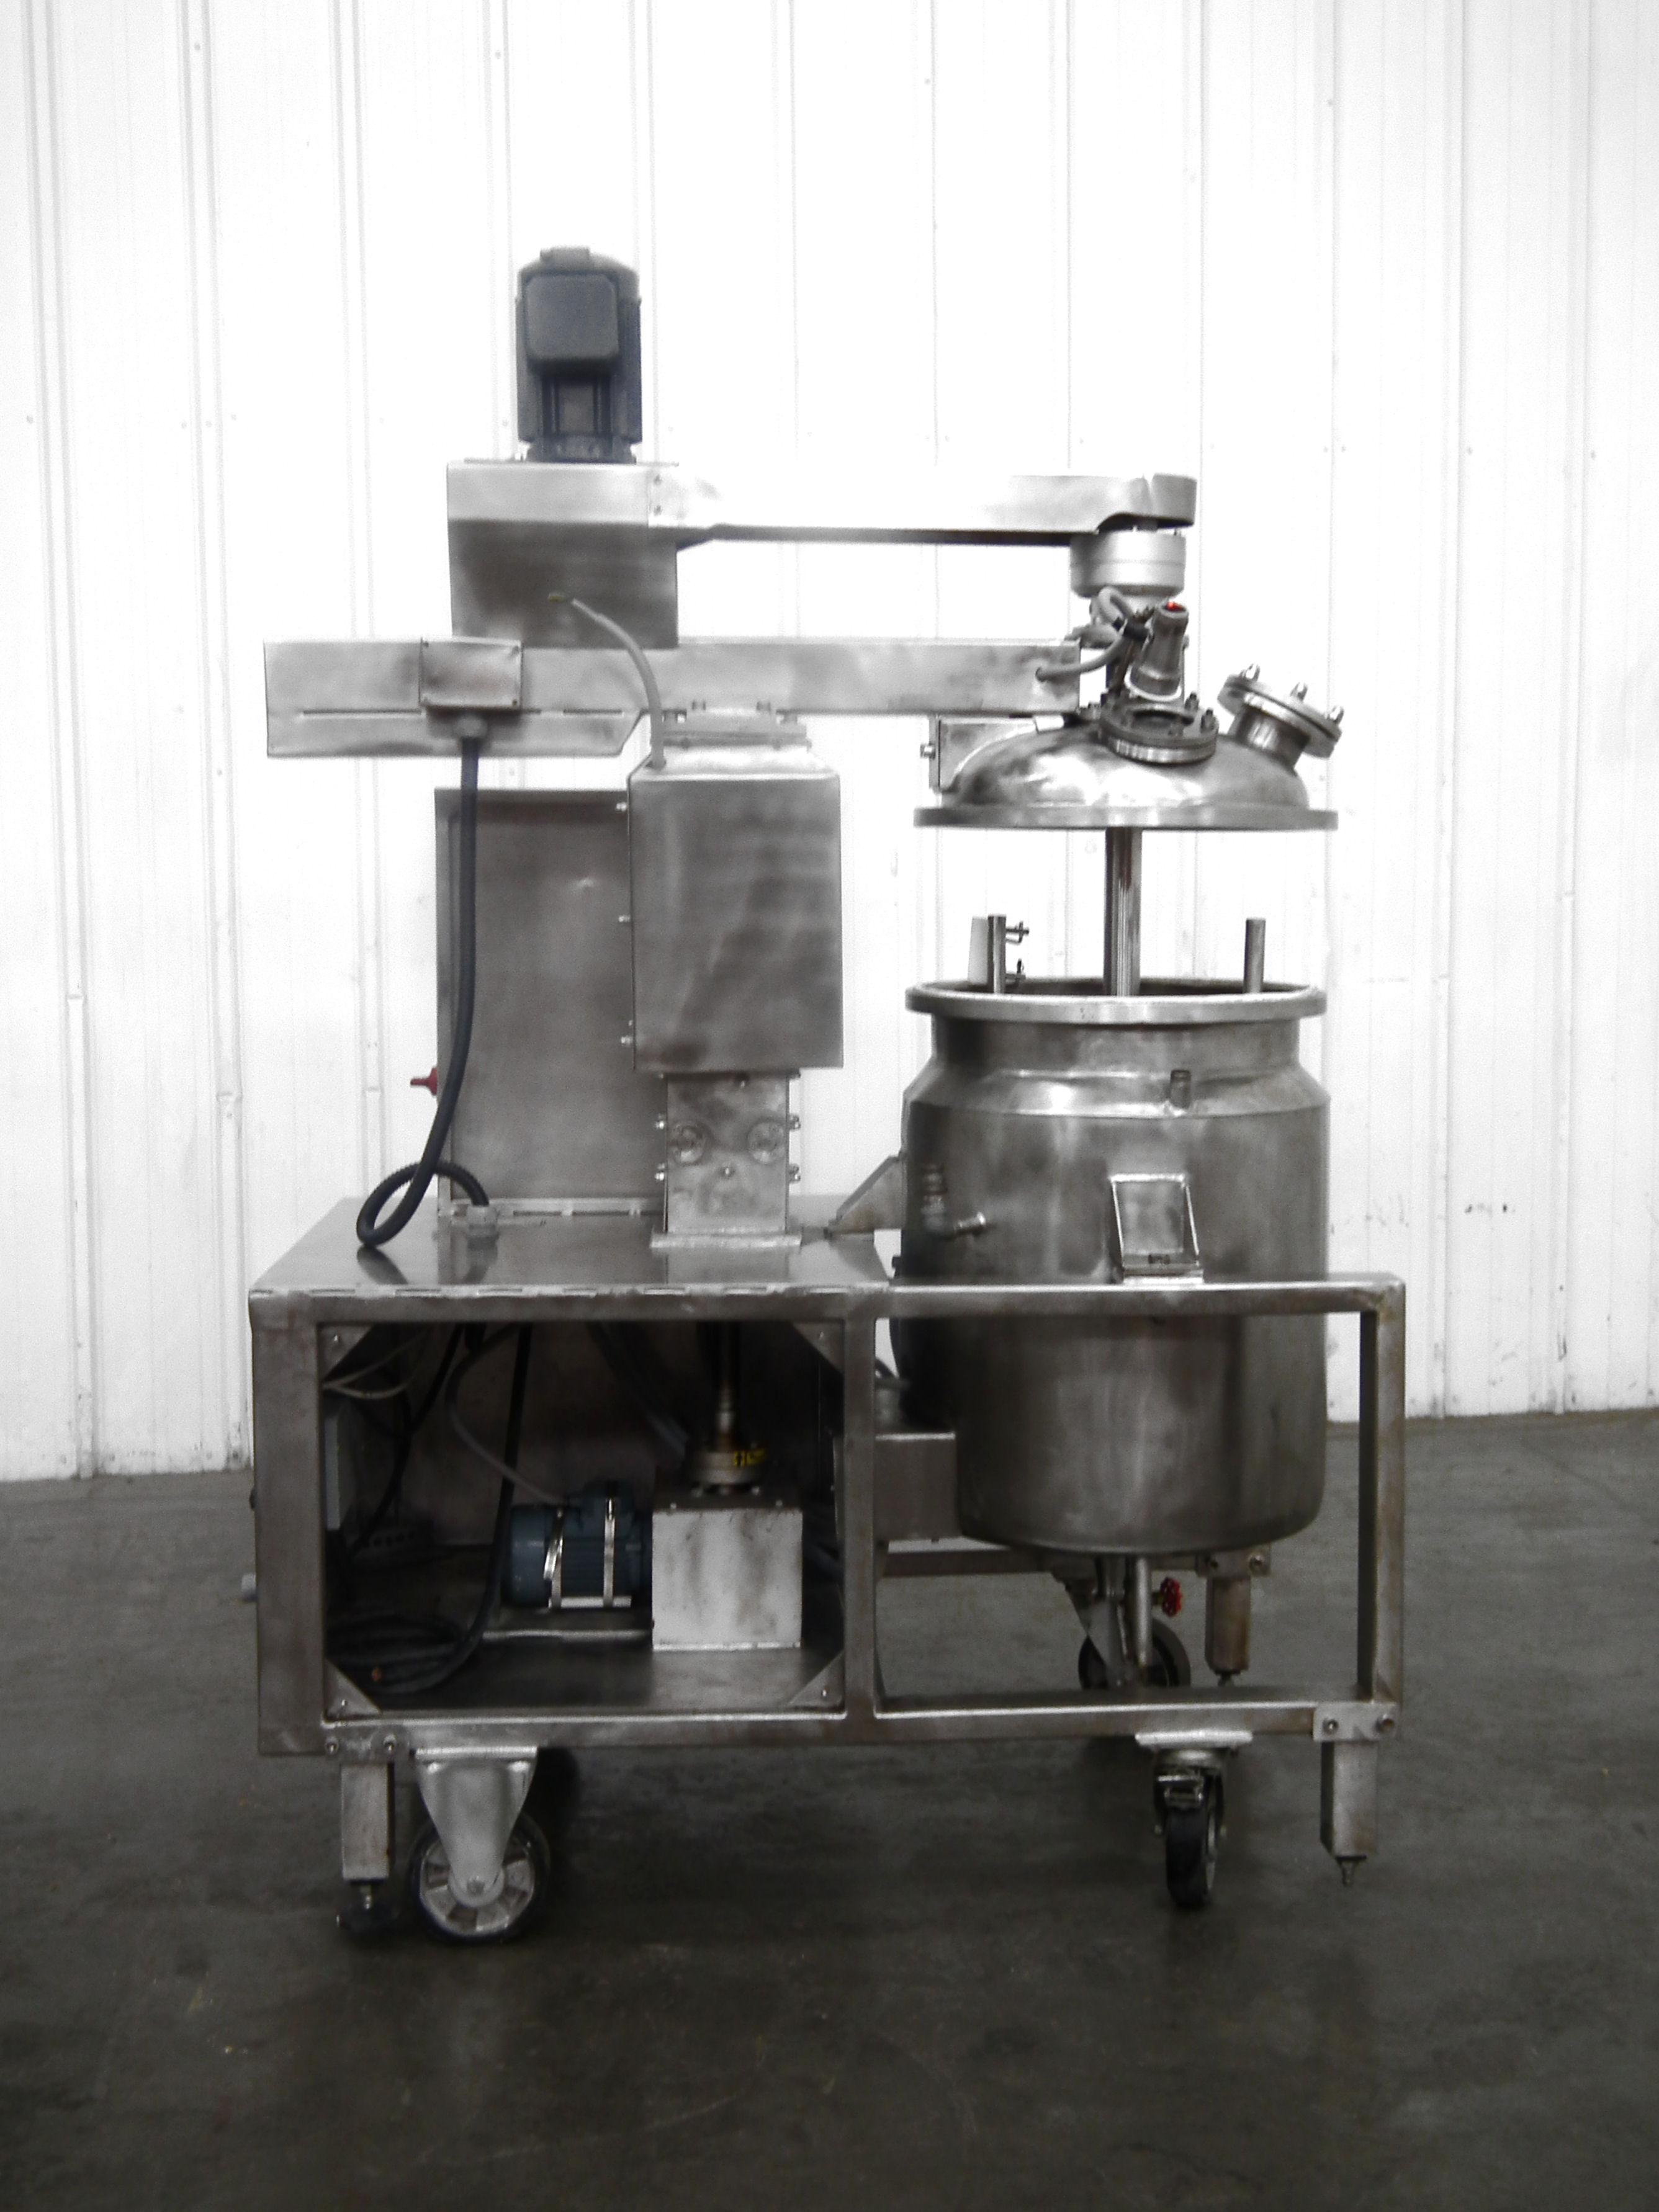 Mega Engineering HPE-VA 40 Gallon Pressure Mixer B3864 - Image 10 of 10